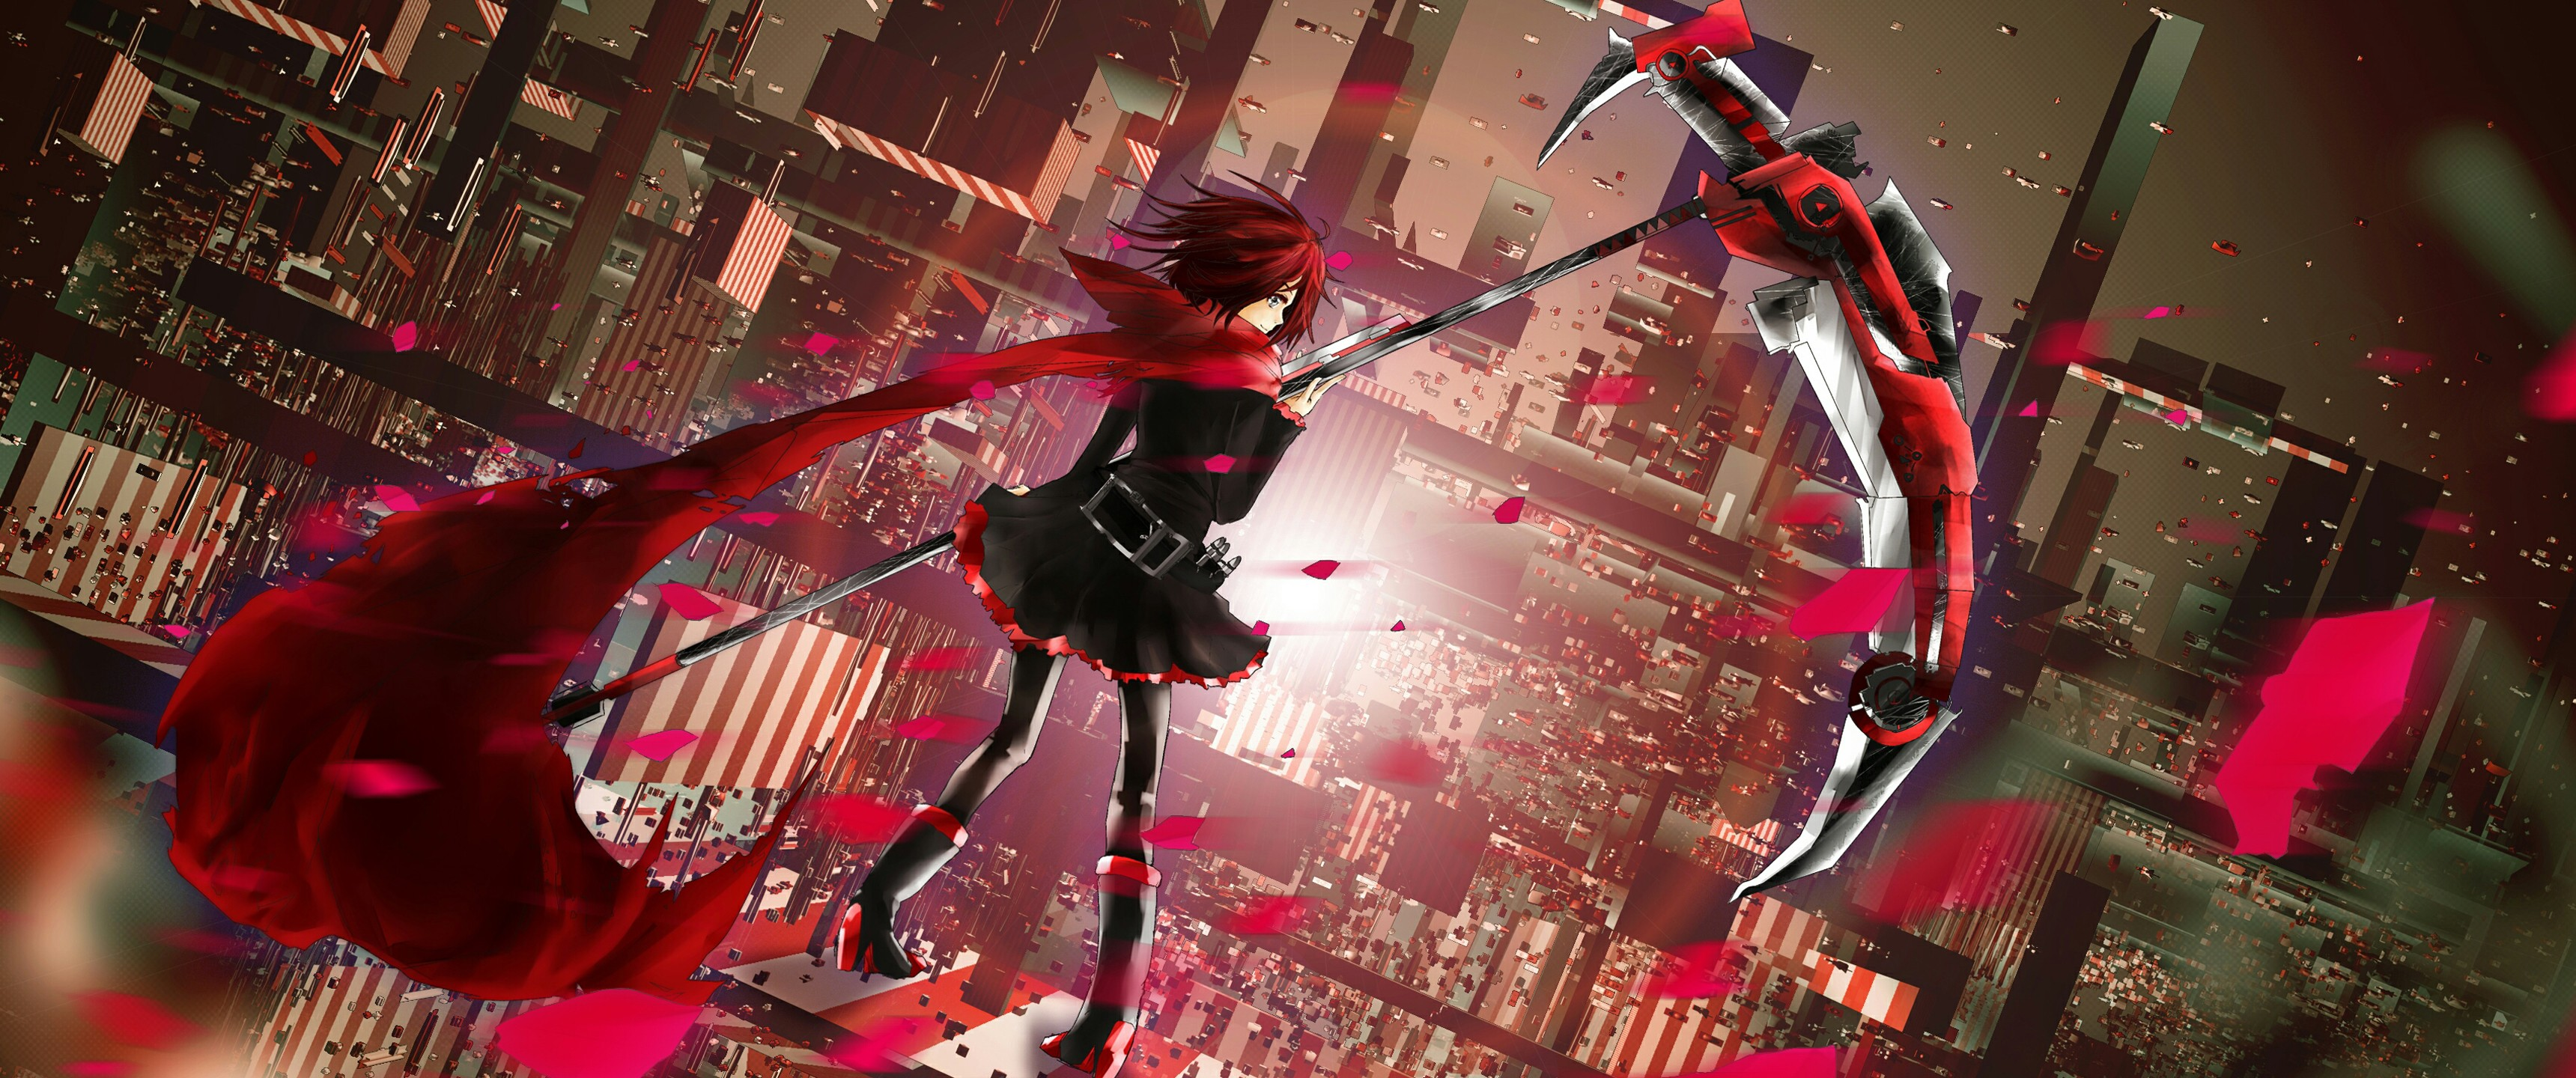 Anime Anime Girls Rwby Ruby Rose Character Wallpaper Resolution 3440x1440 Id 4274 Wallha Com